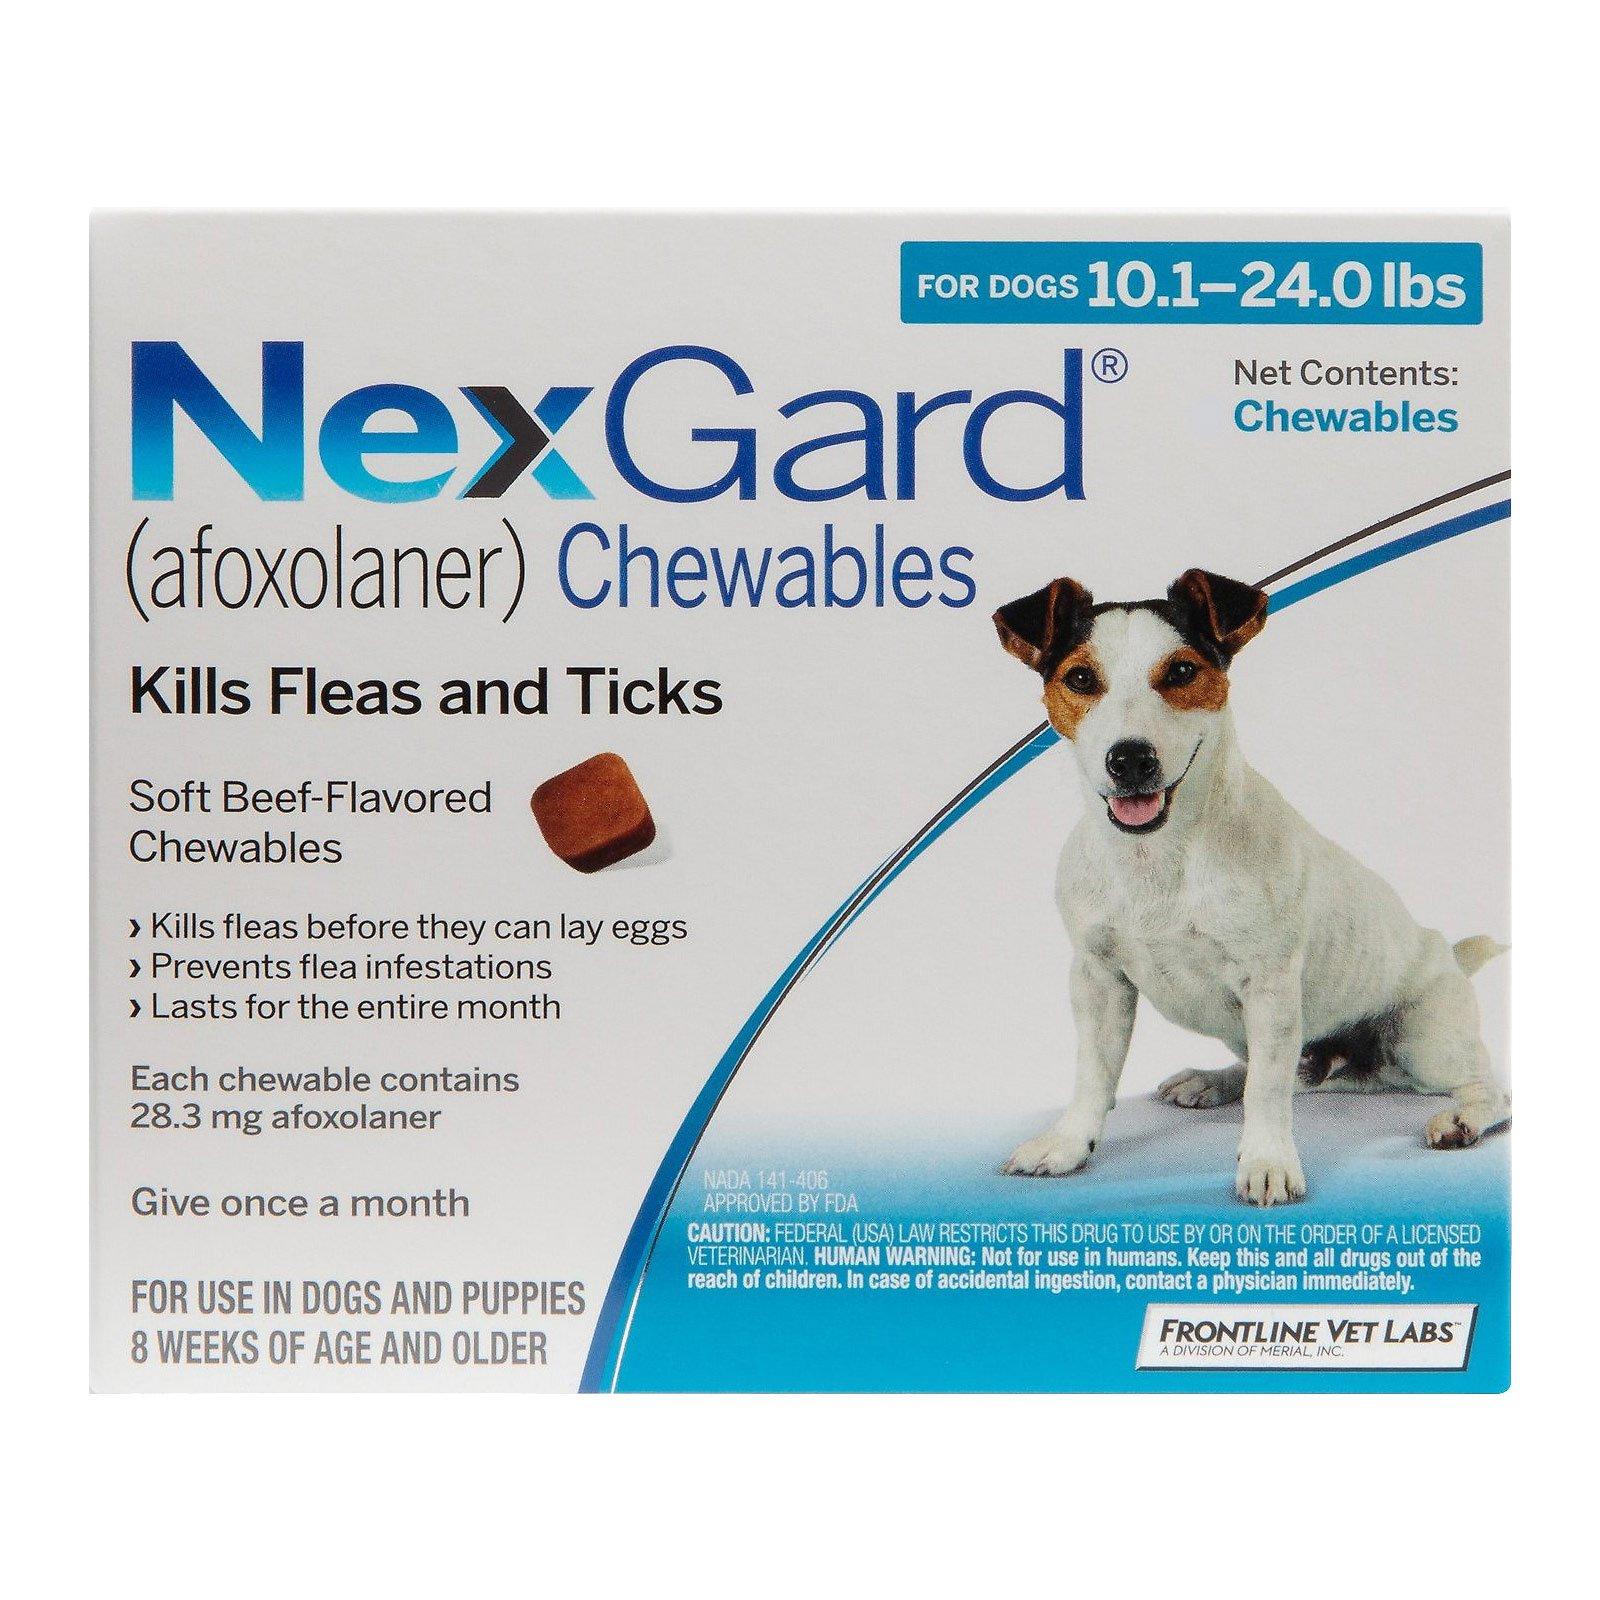 Nexgard for Dog Supplies